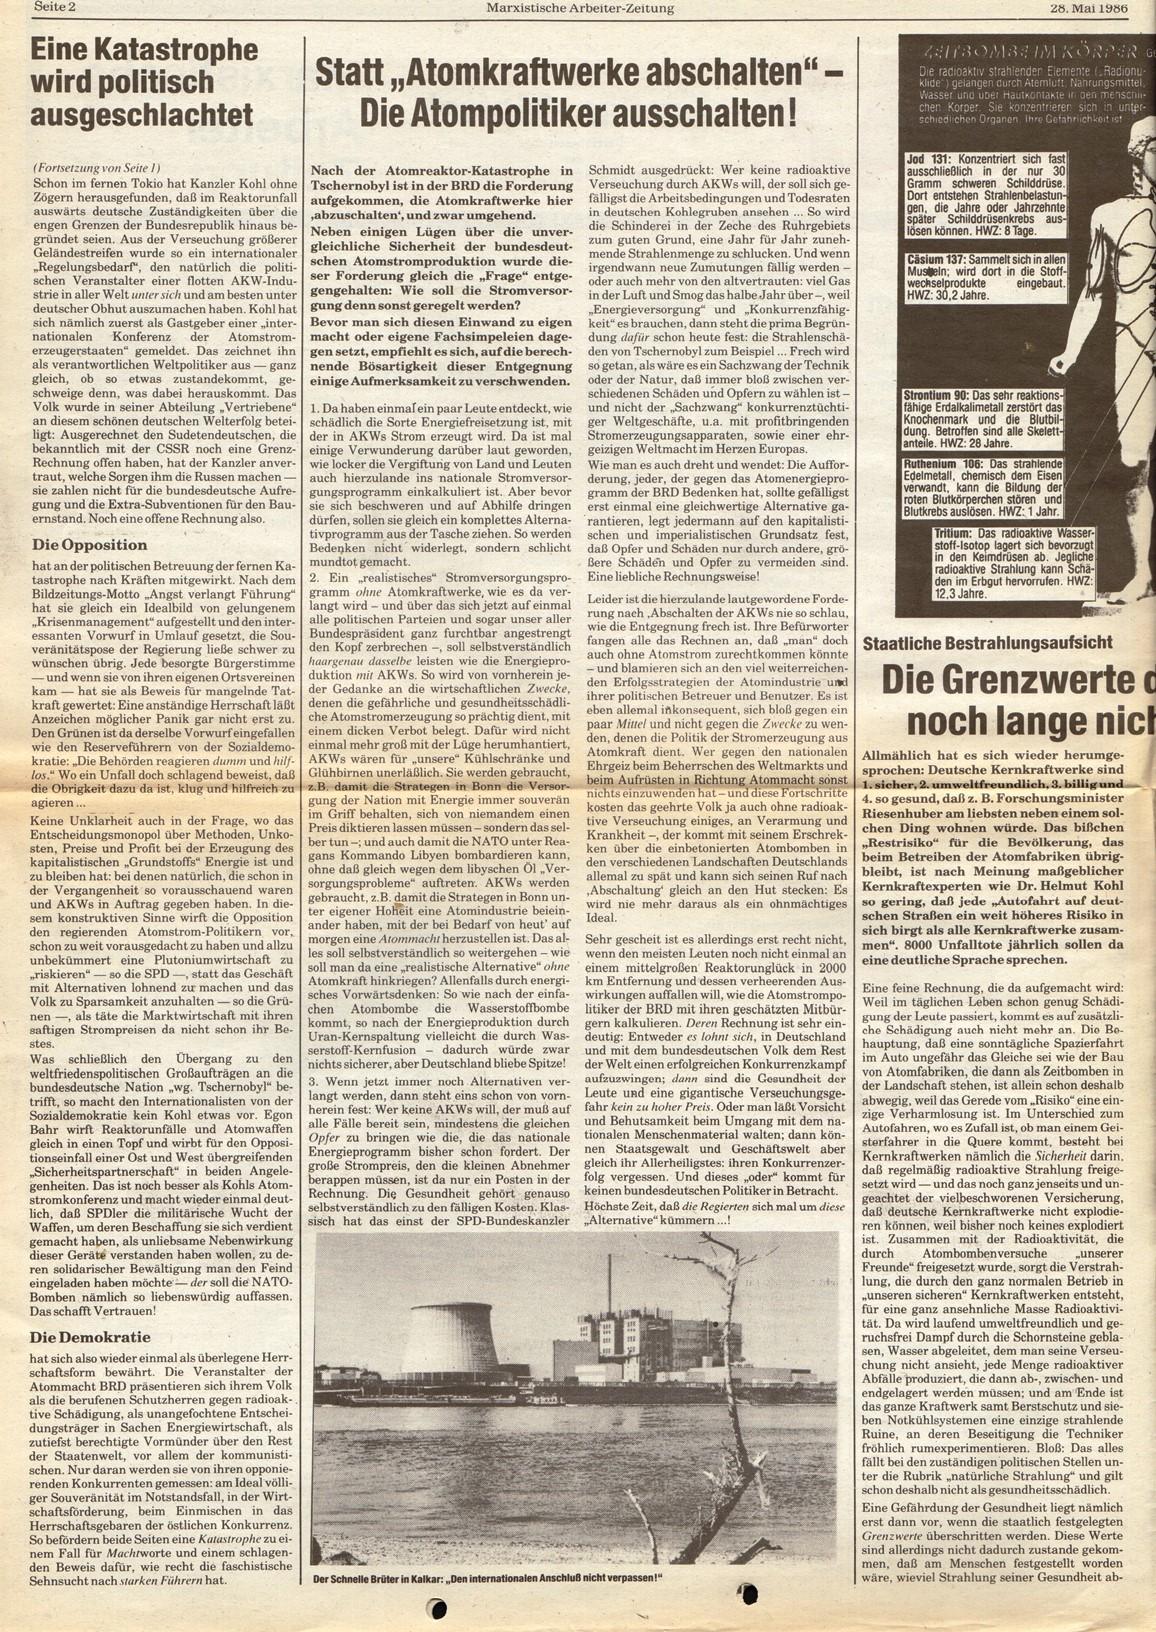 Muenchen_MG_MAZ_Krauss_Maffei_19860528_02